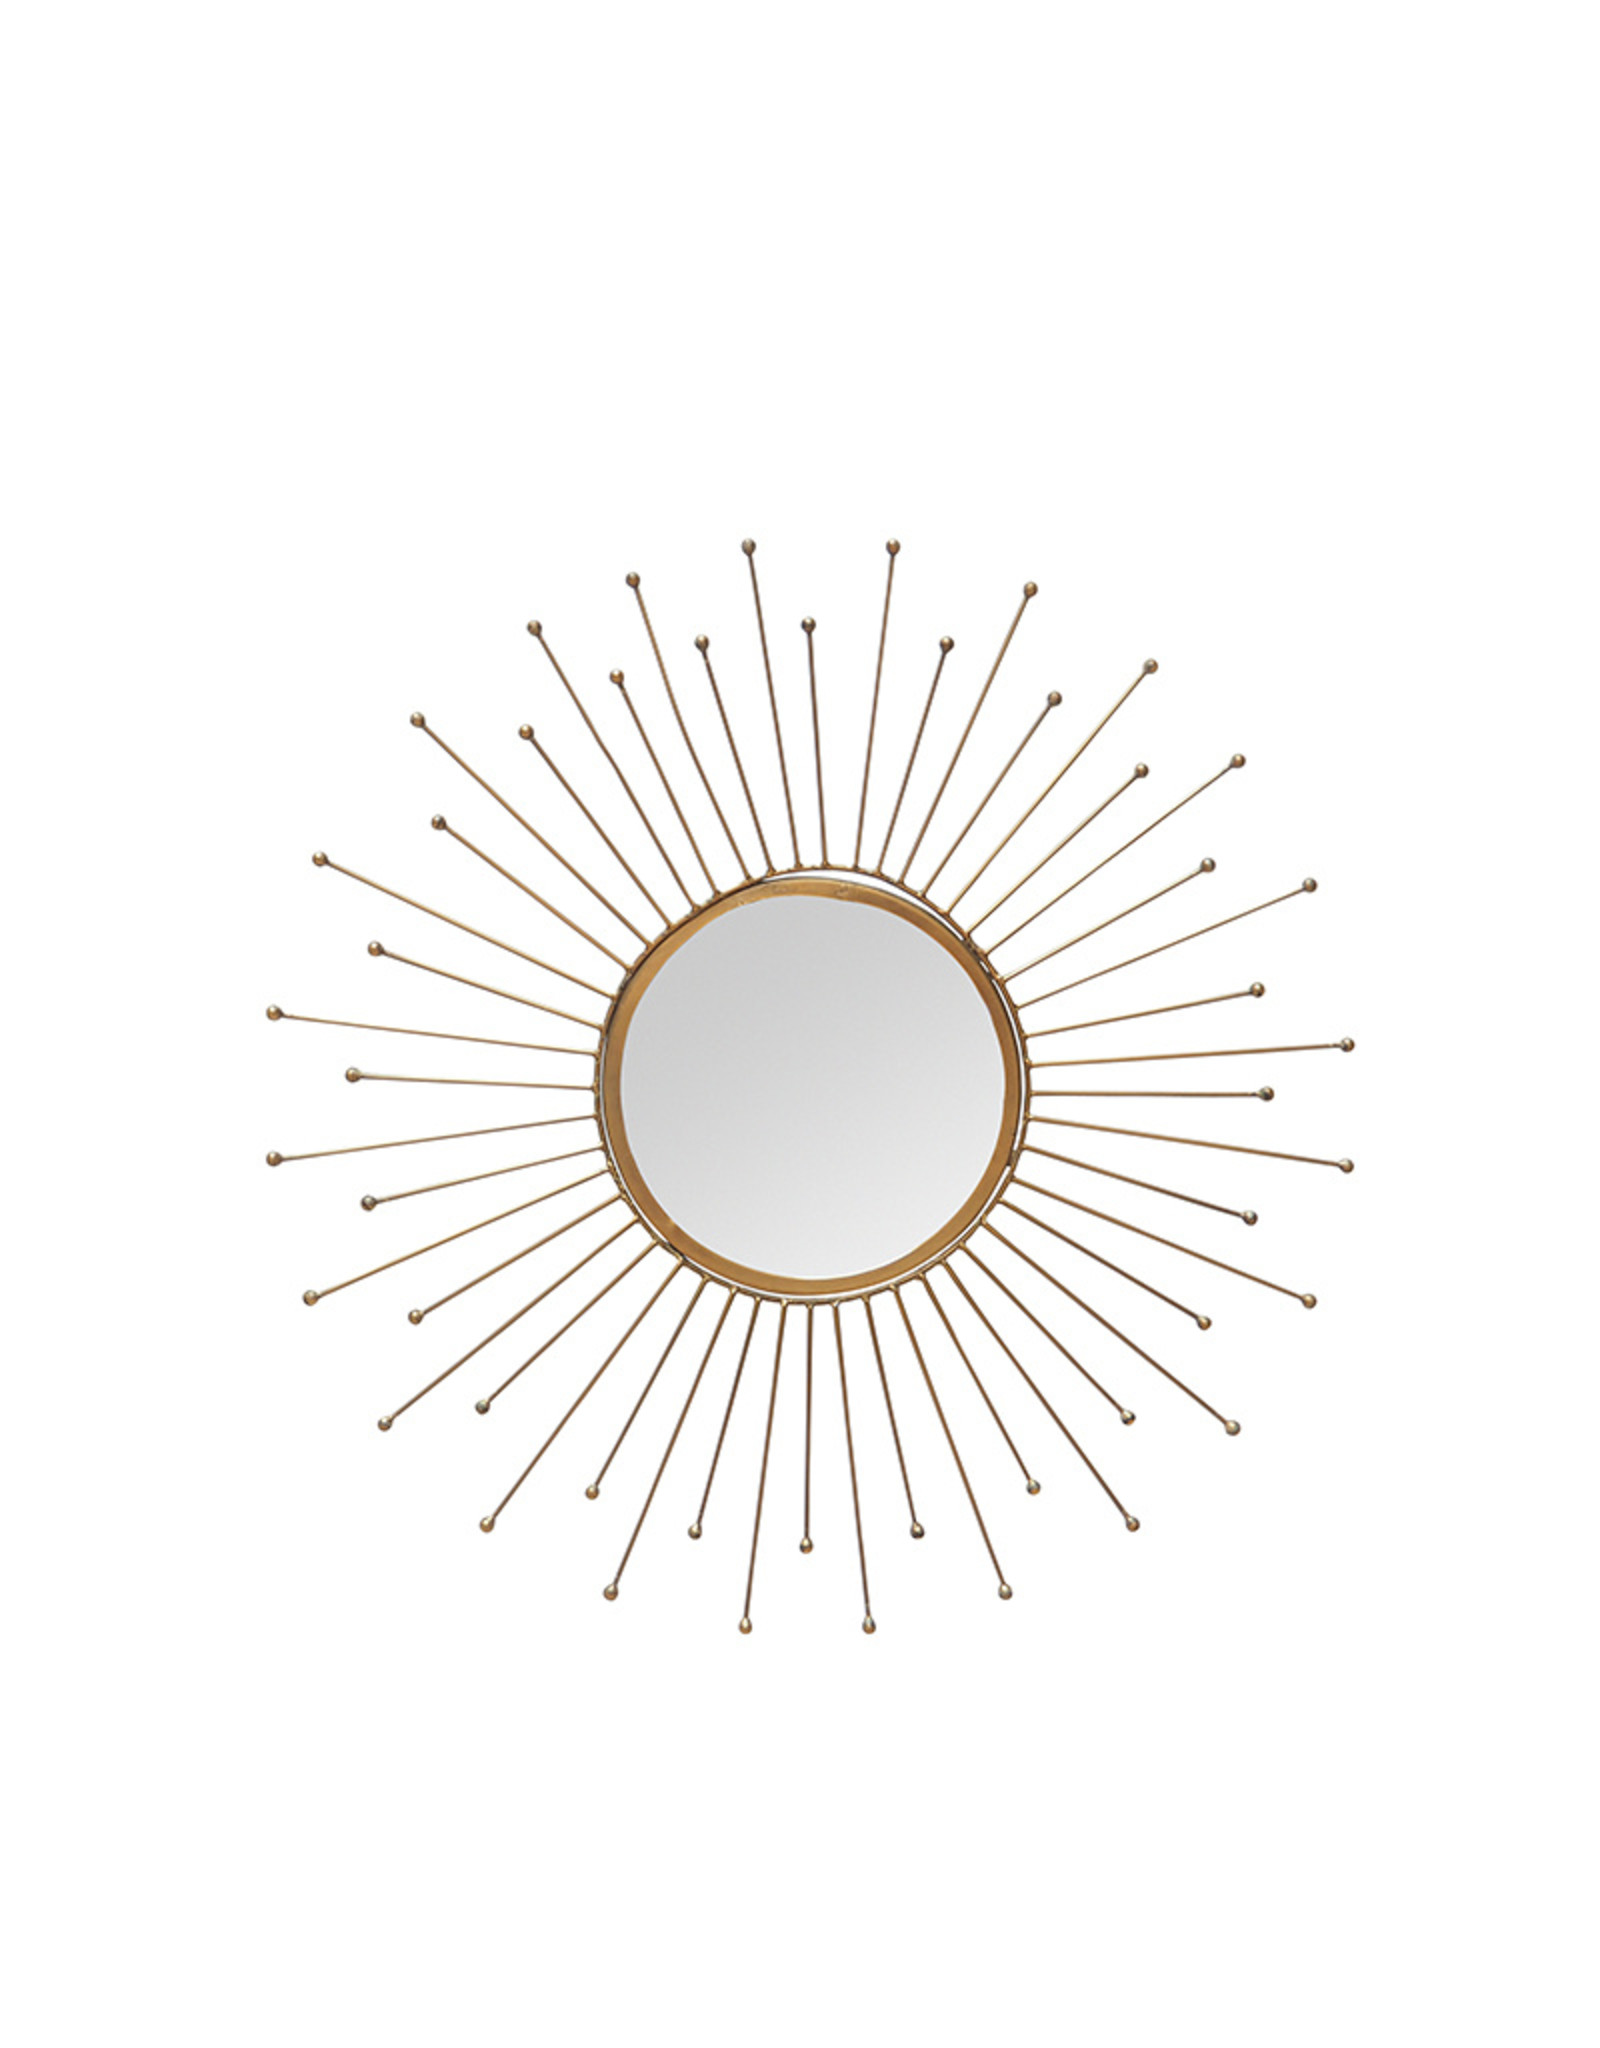 Brass finish sun mirror